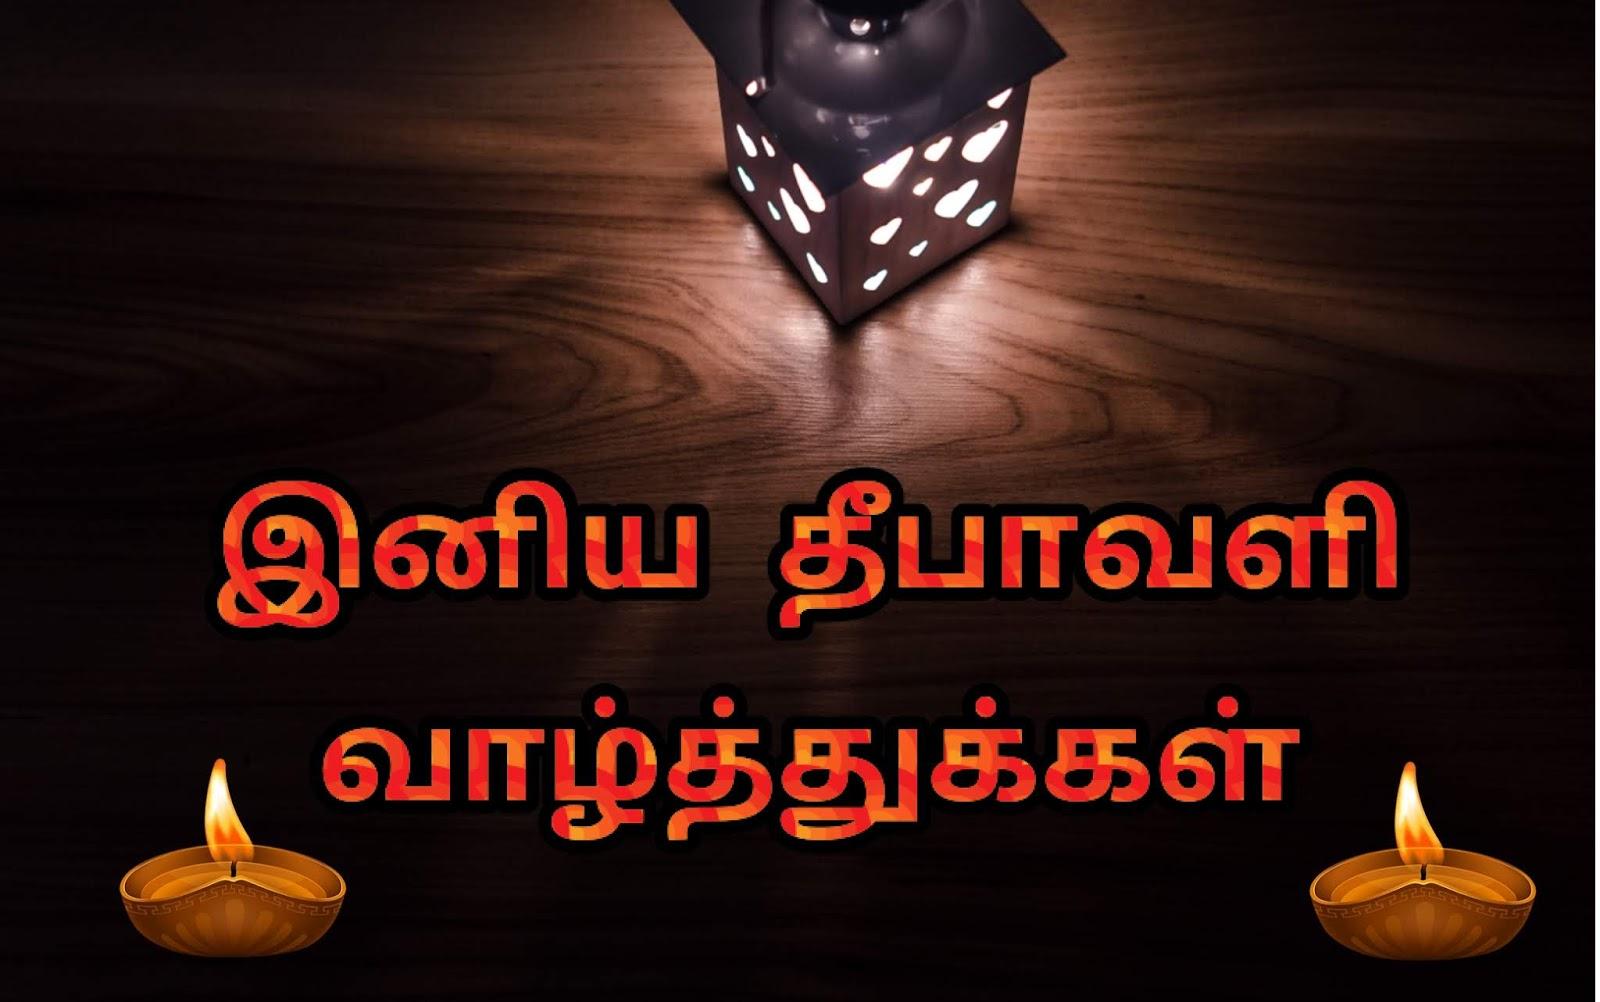 Happy Diwali Whatsapp Status In Tamil 2018 Language Font Text